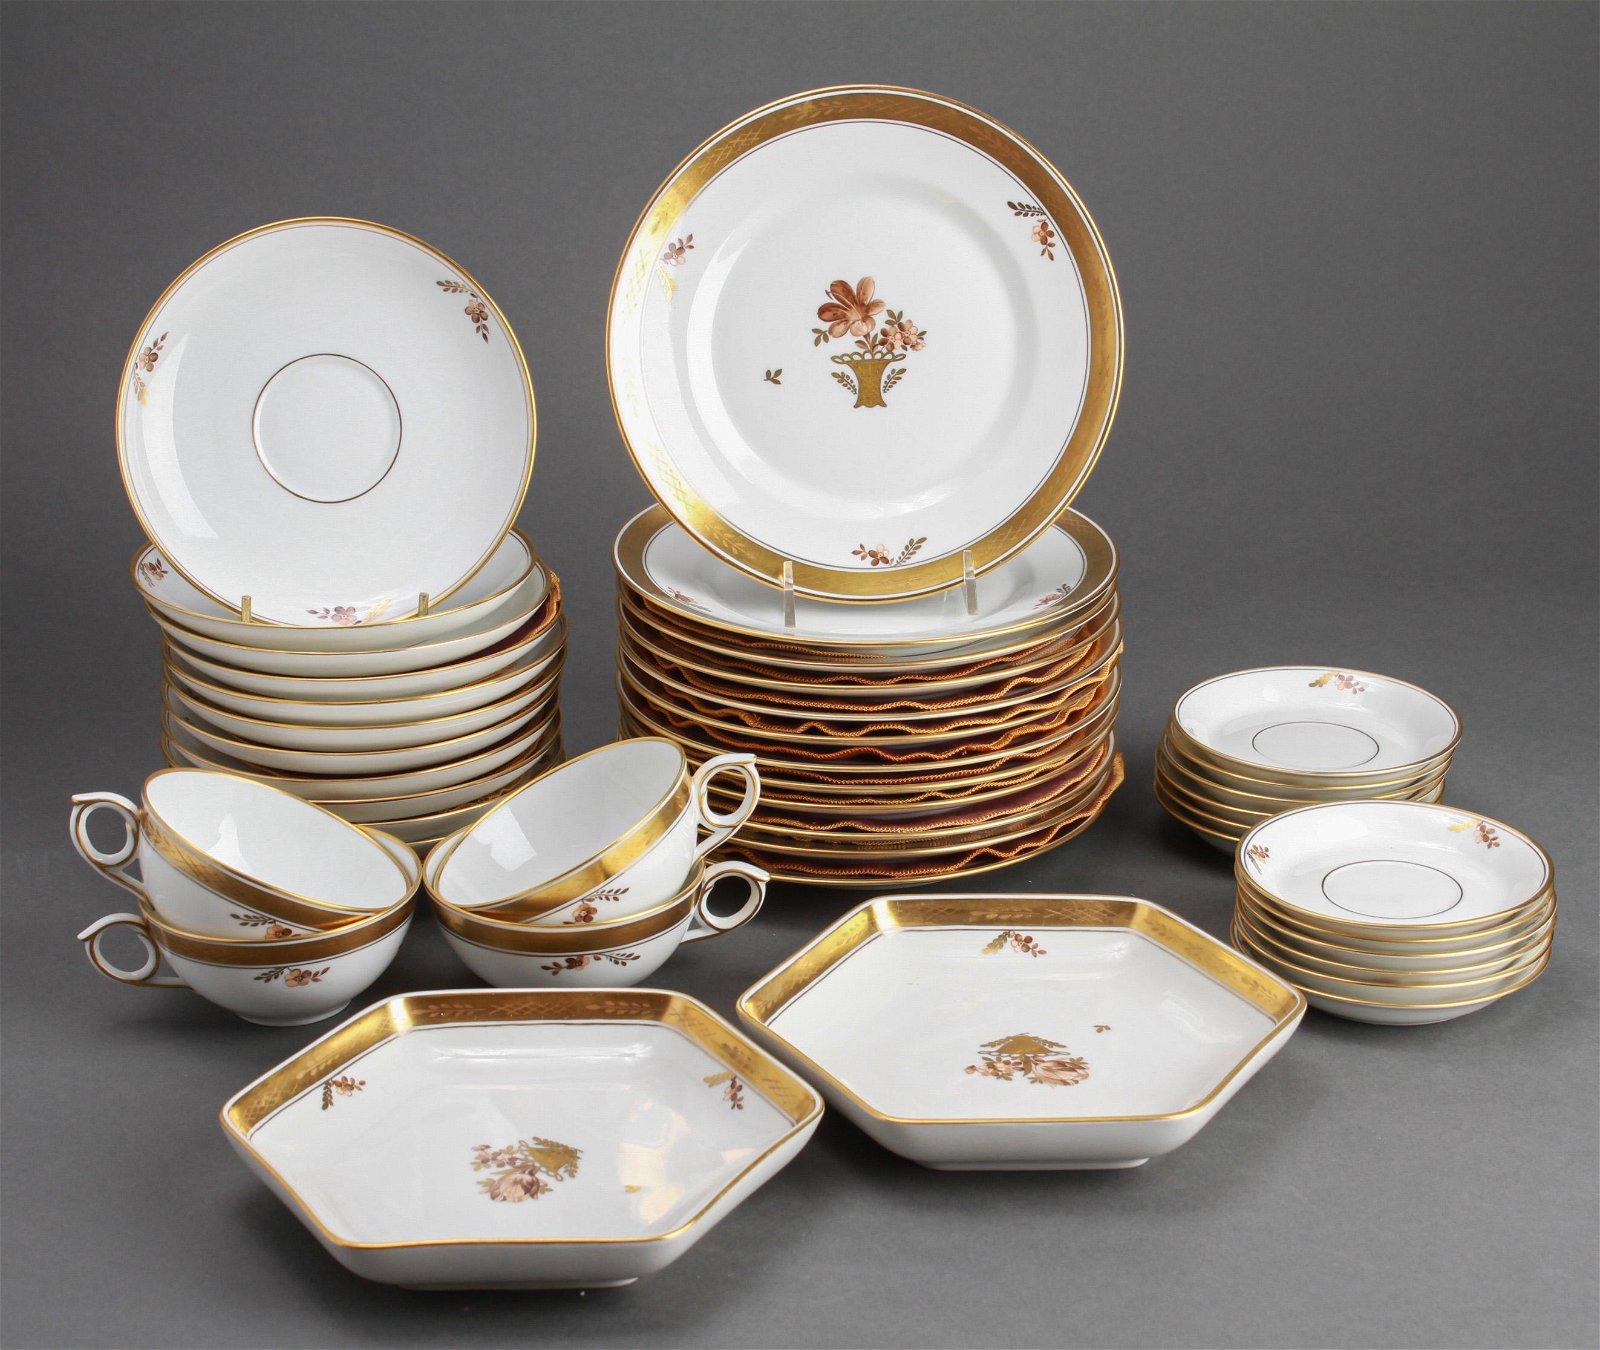 Royal Copenhagen Golden Basket Dessert Set, 40 pc